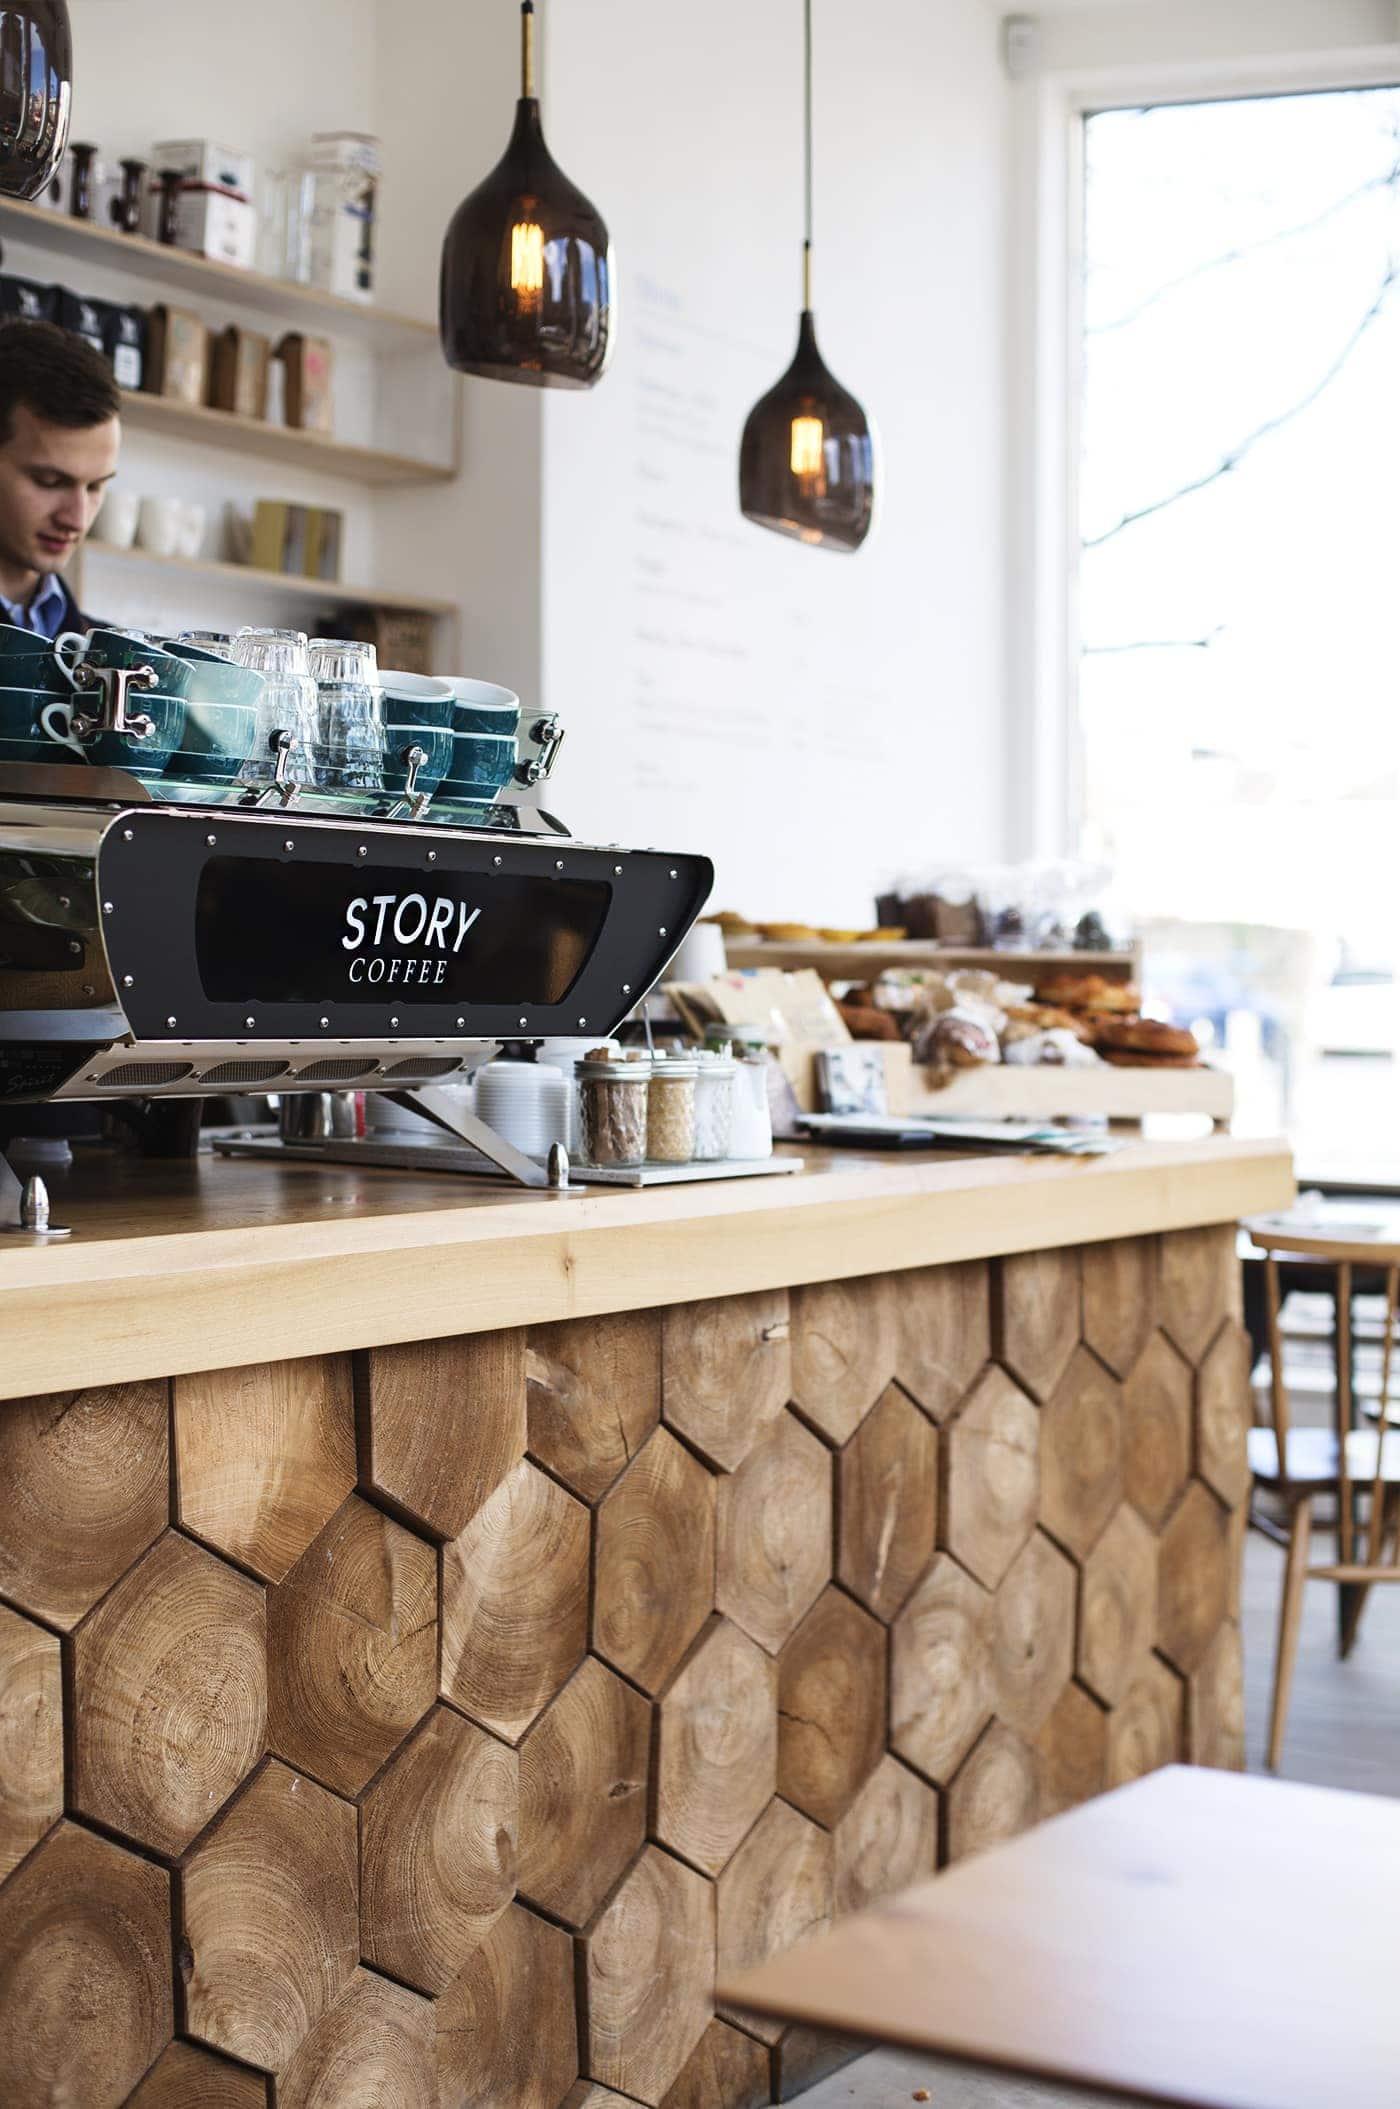 Clapham staycation | Story Coffee interiors 3 | mini break